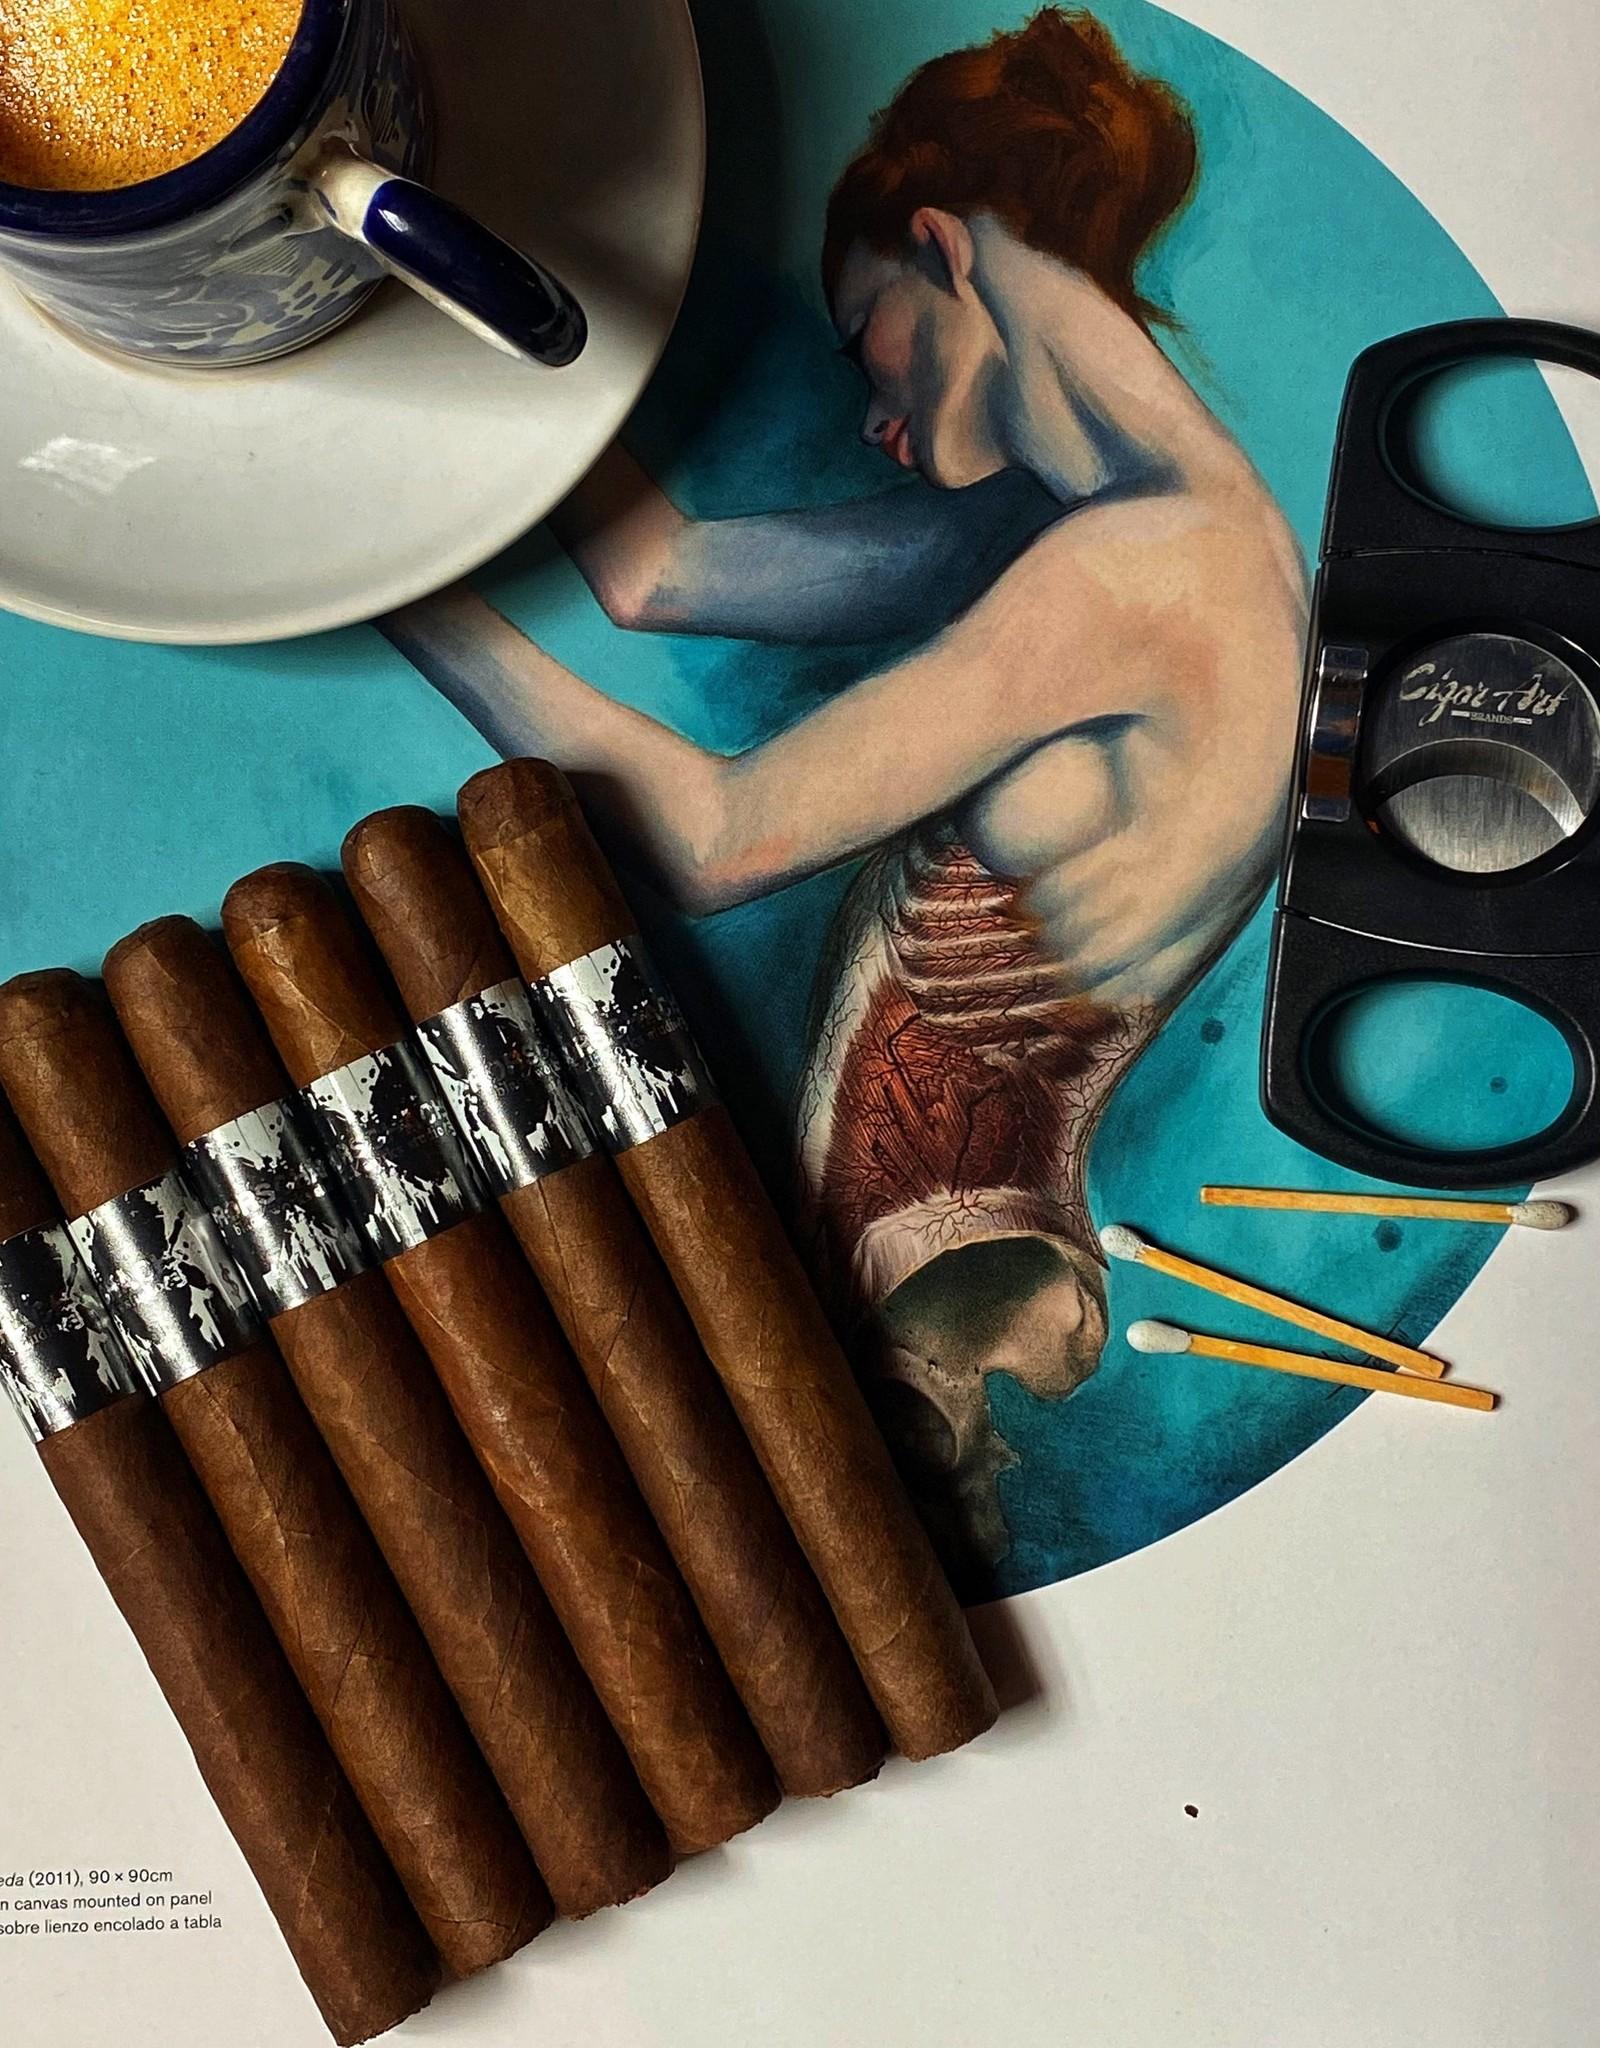 Cigar Art Copy of Copy of Black Works Studio Rorschach Petit Panatella 5 x 38 Flight of 6